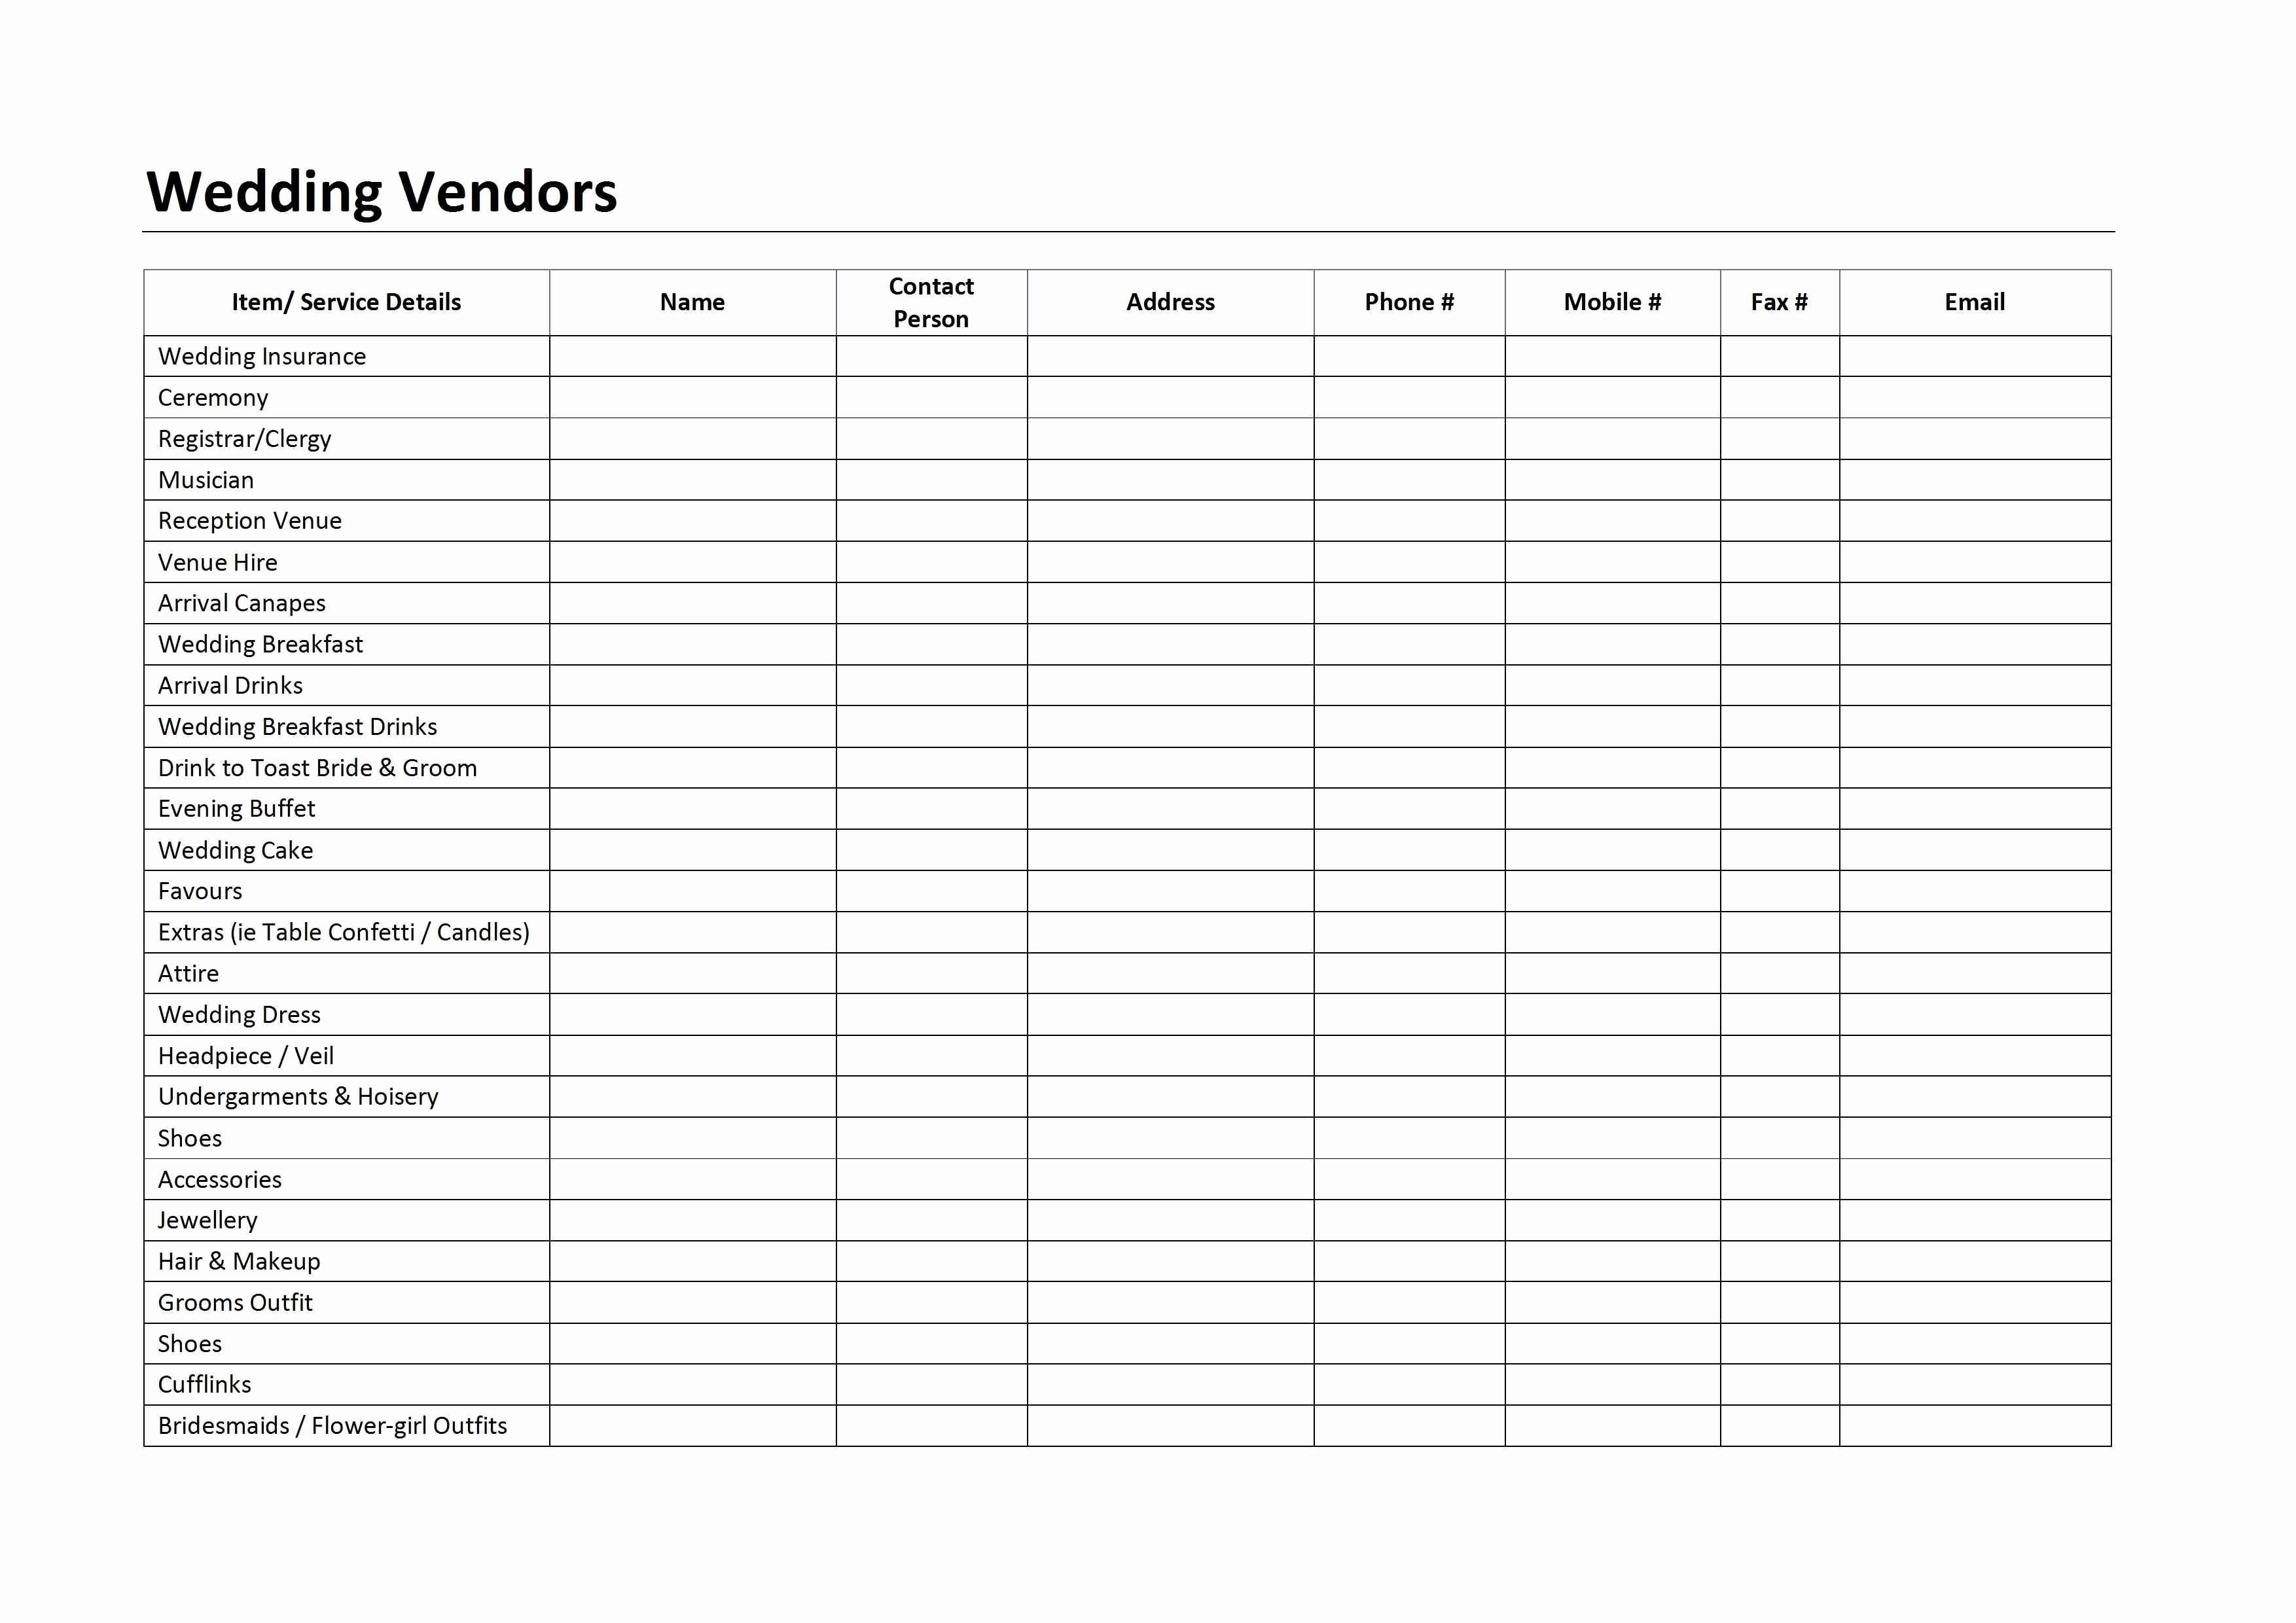 Wedding Vendors List Template Fresh Wedding Vendors